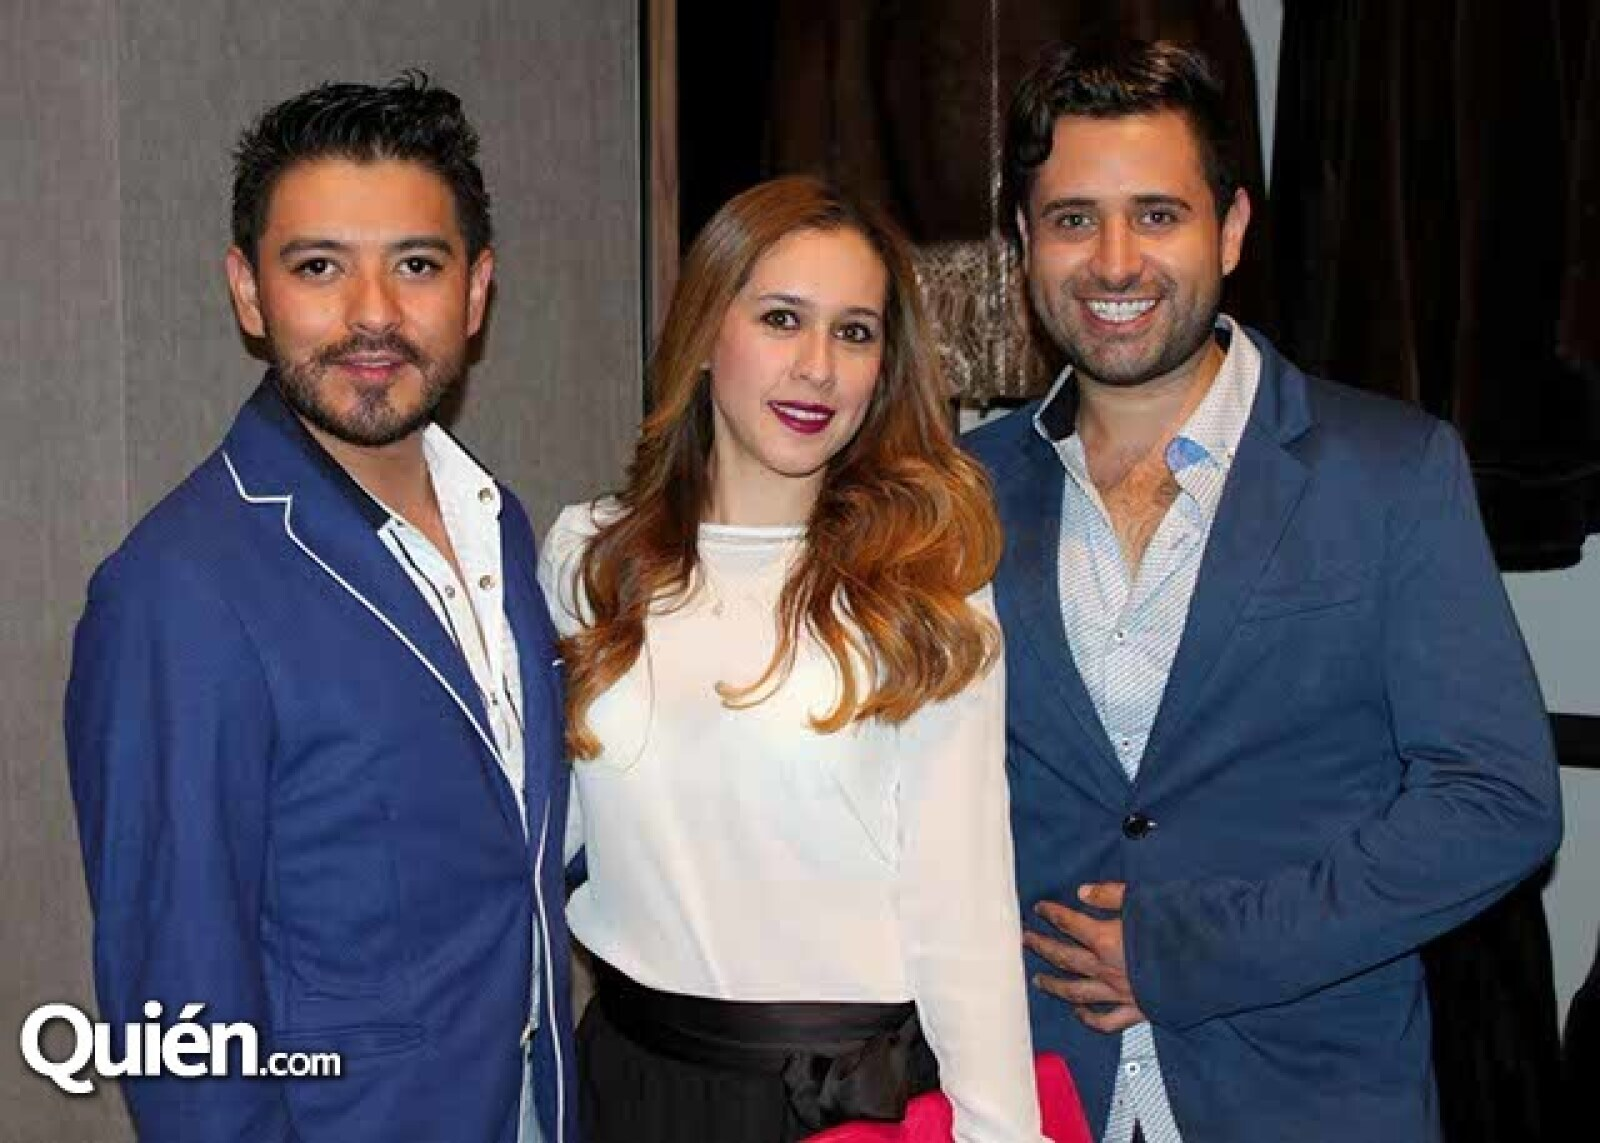 Alberto Becerra,Mariana Artiaga y Eduardo Alcala%u0301